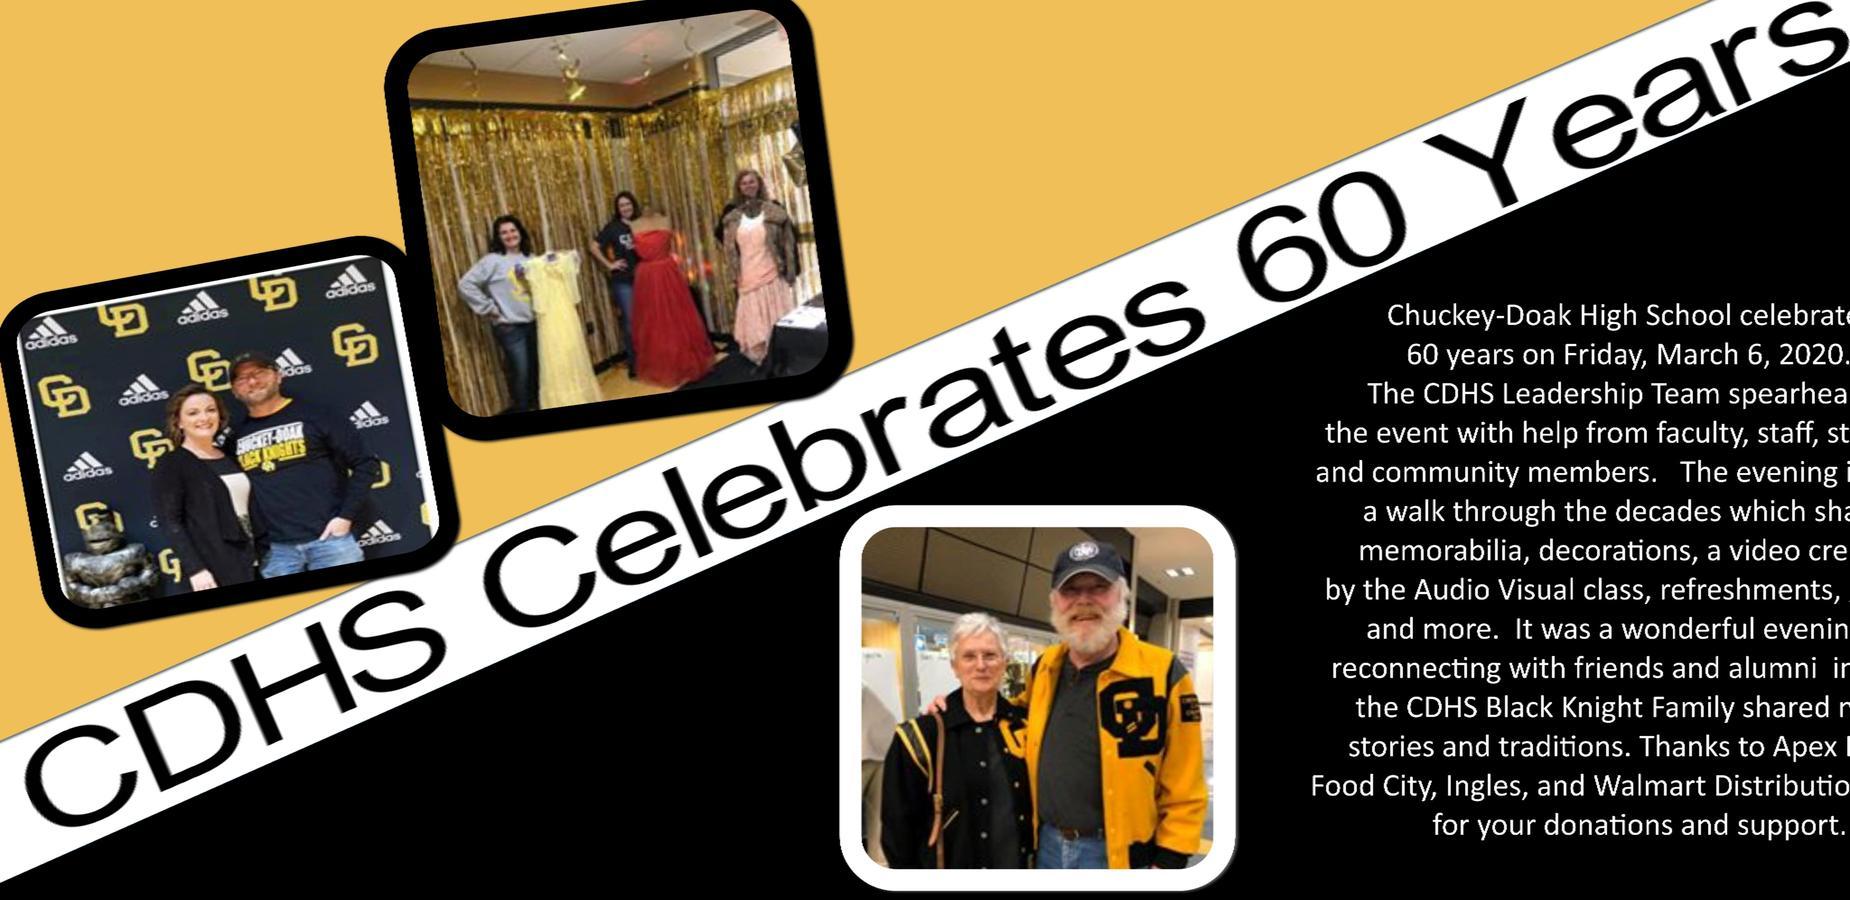 CDHS Celebrates 60 Years